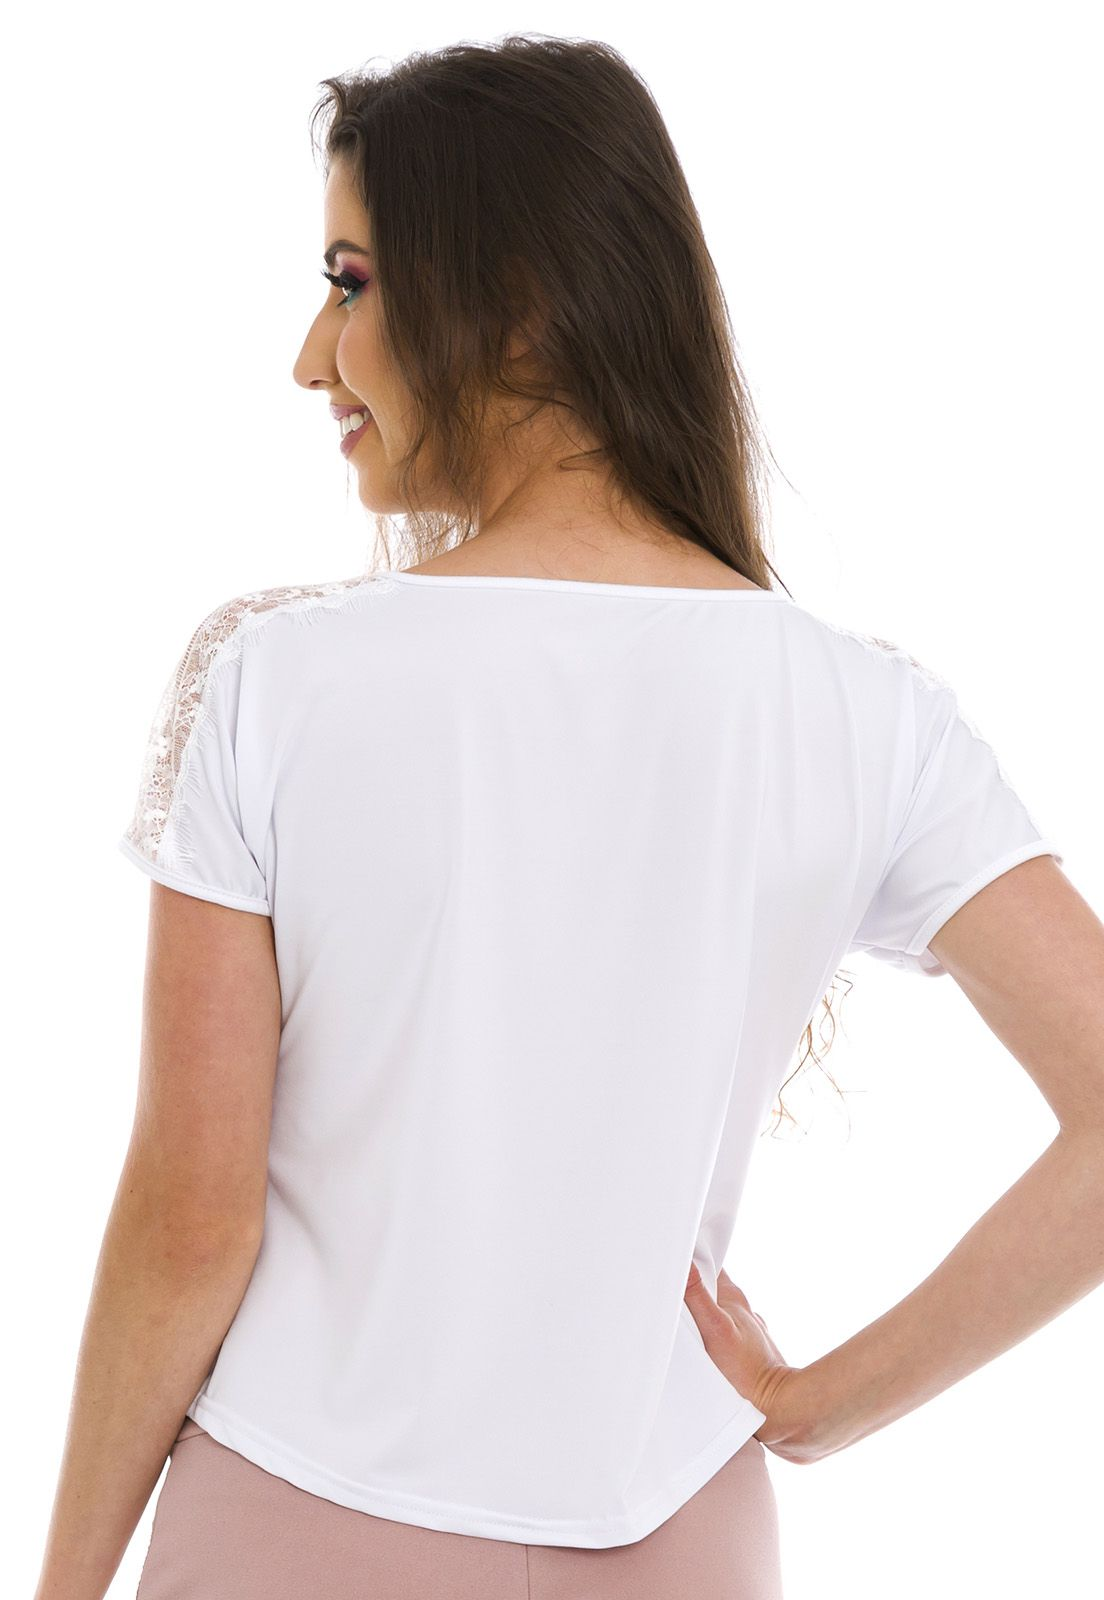 Blusa Detalhe Ombro Branca